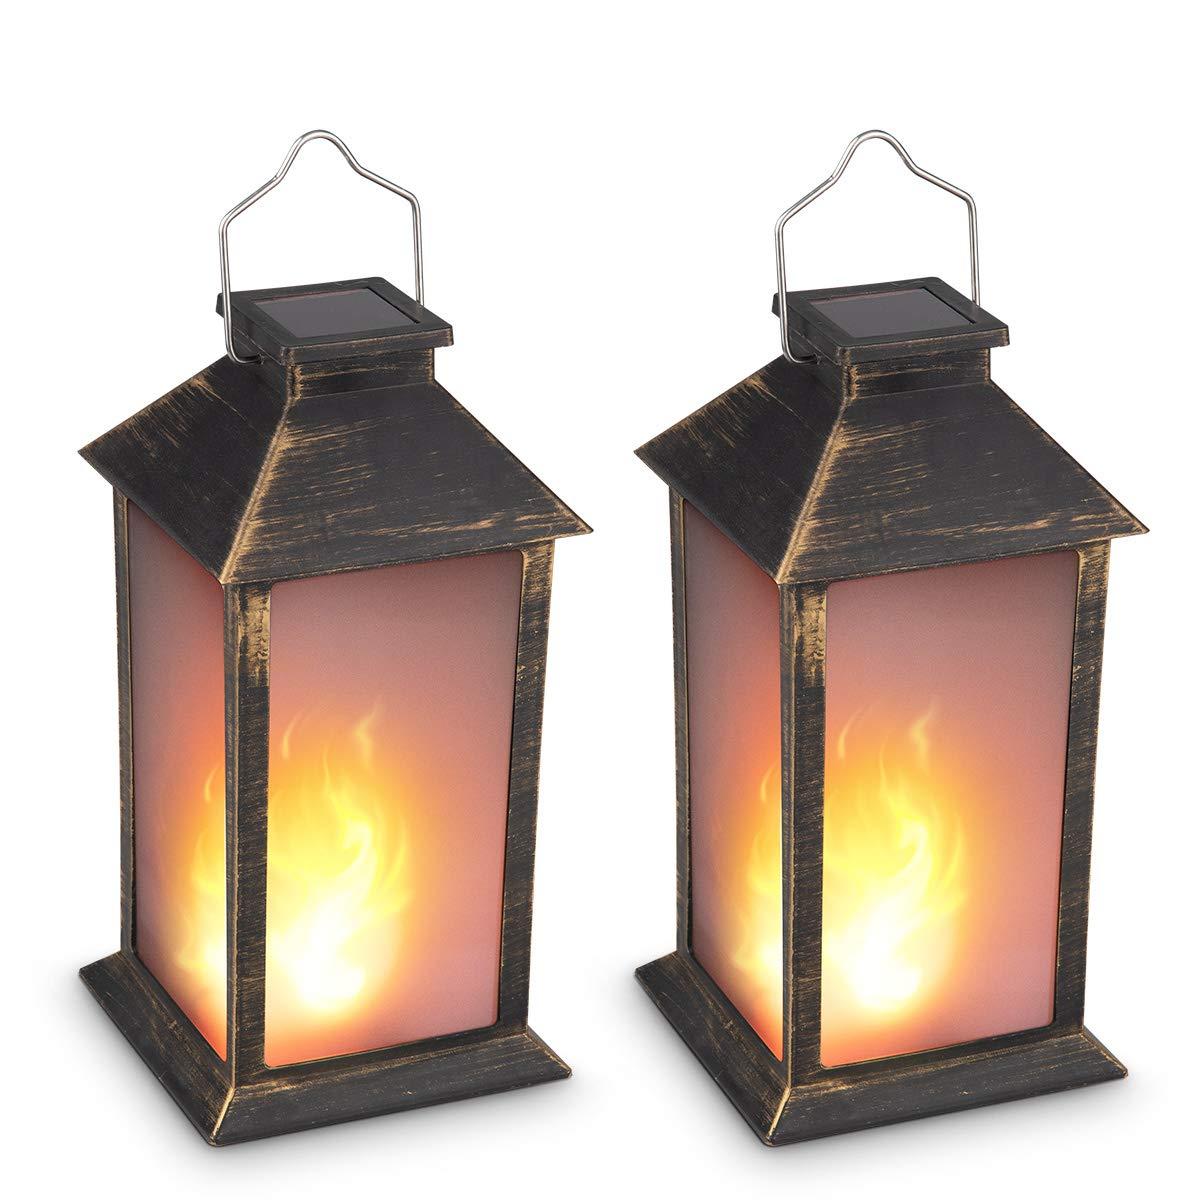 13'' Vintage Style Solar Powered Candle Lantern(Metallic Coating Black,Plastic),Solar Garden Light with Vivid Fire Effect,Outdoor Solar Hanging Lantern,Decorative Candle Lanterns ZKEE (Set of 2)